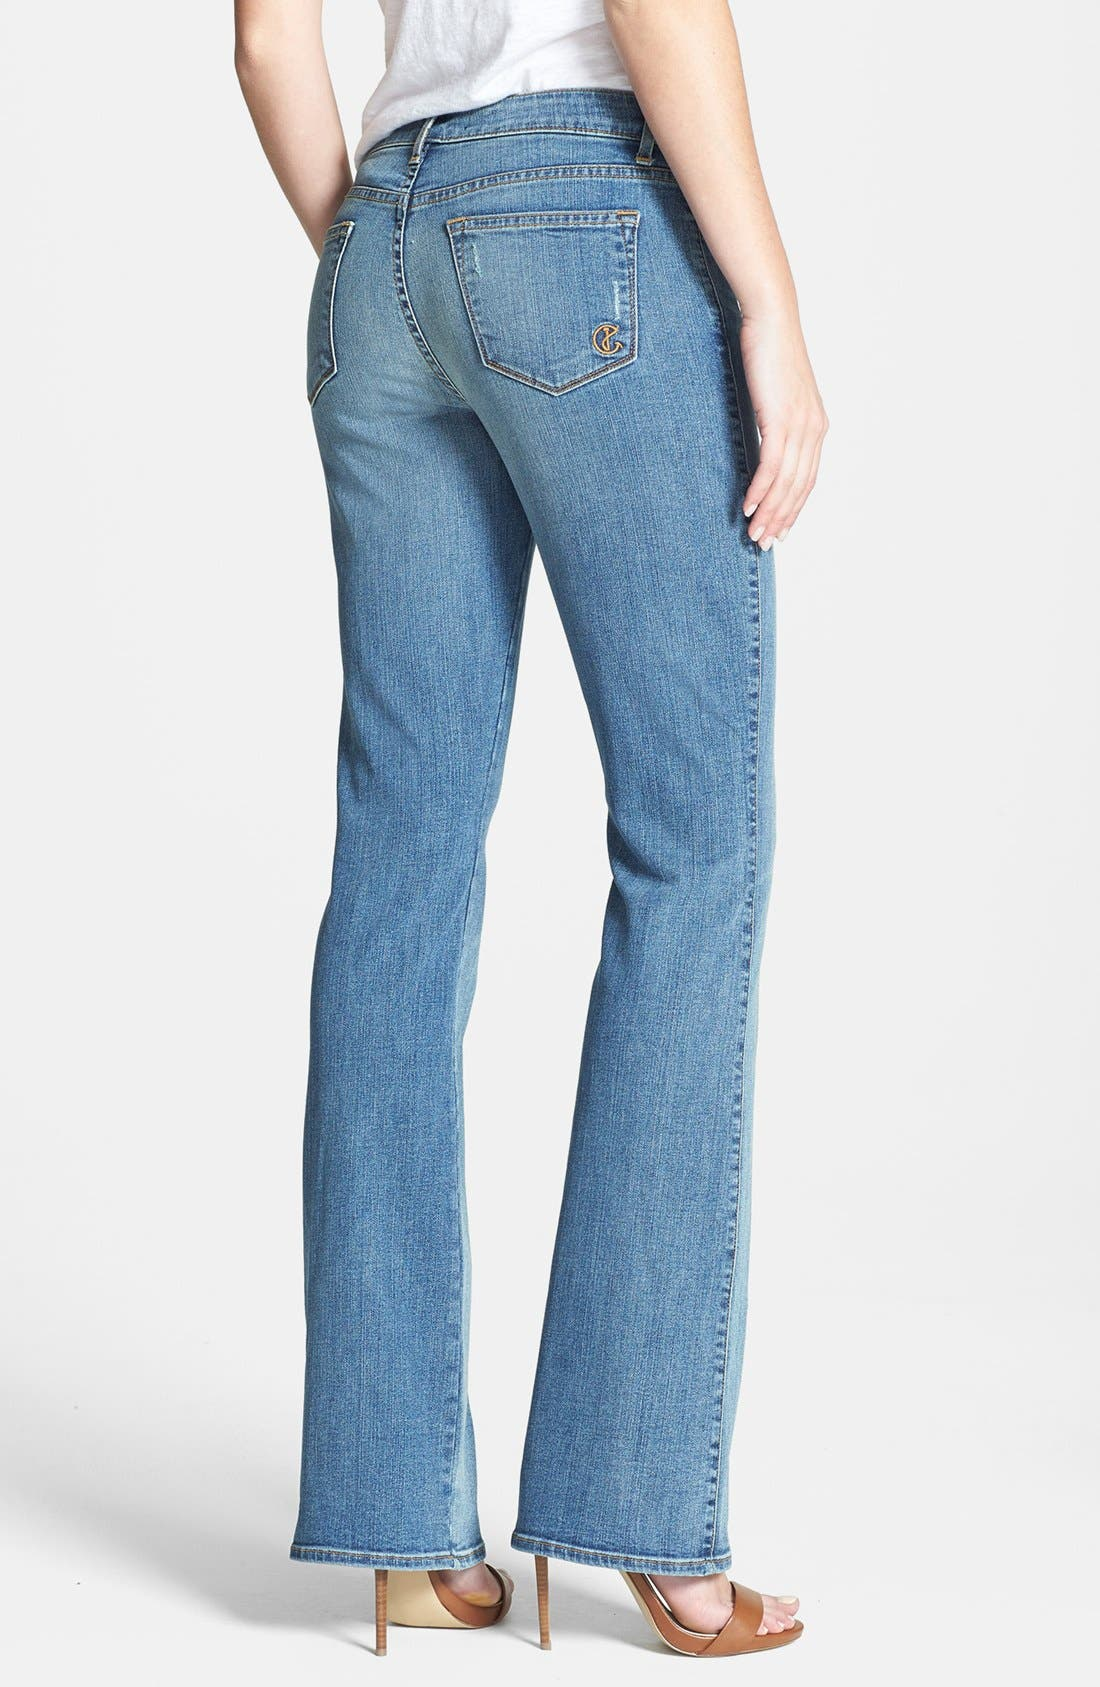 Alternate Image 2  - CJ by Cookie Johnson 'Grace' Bootcut Jeans (Aliamanu)